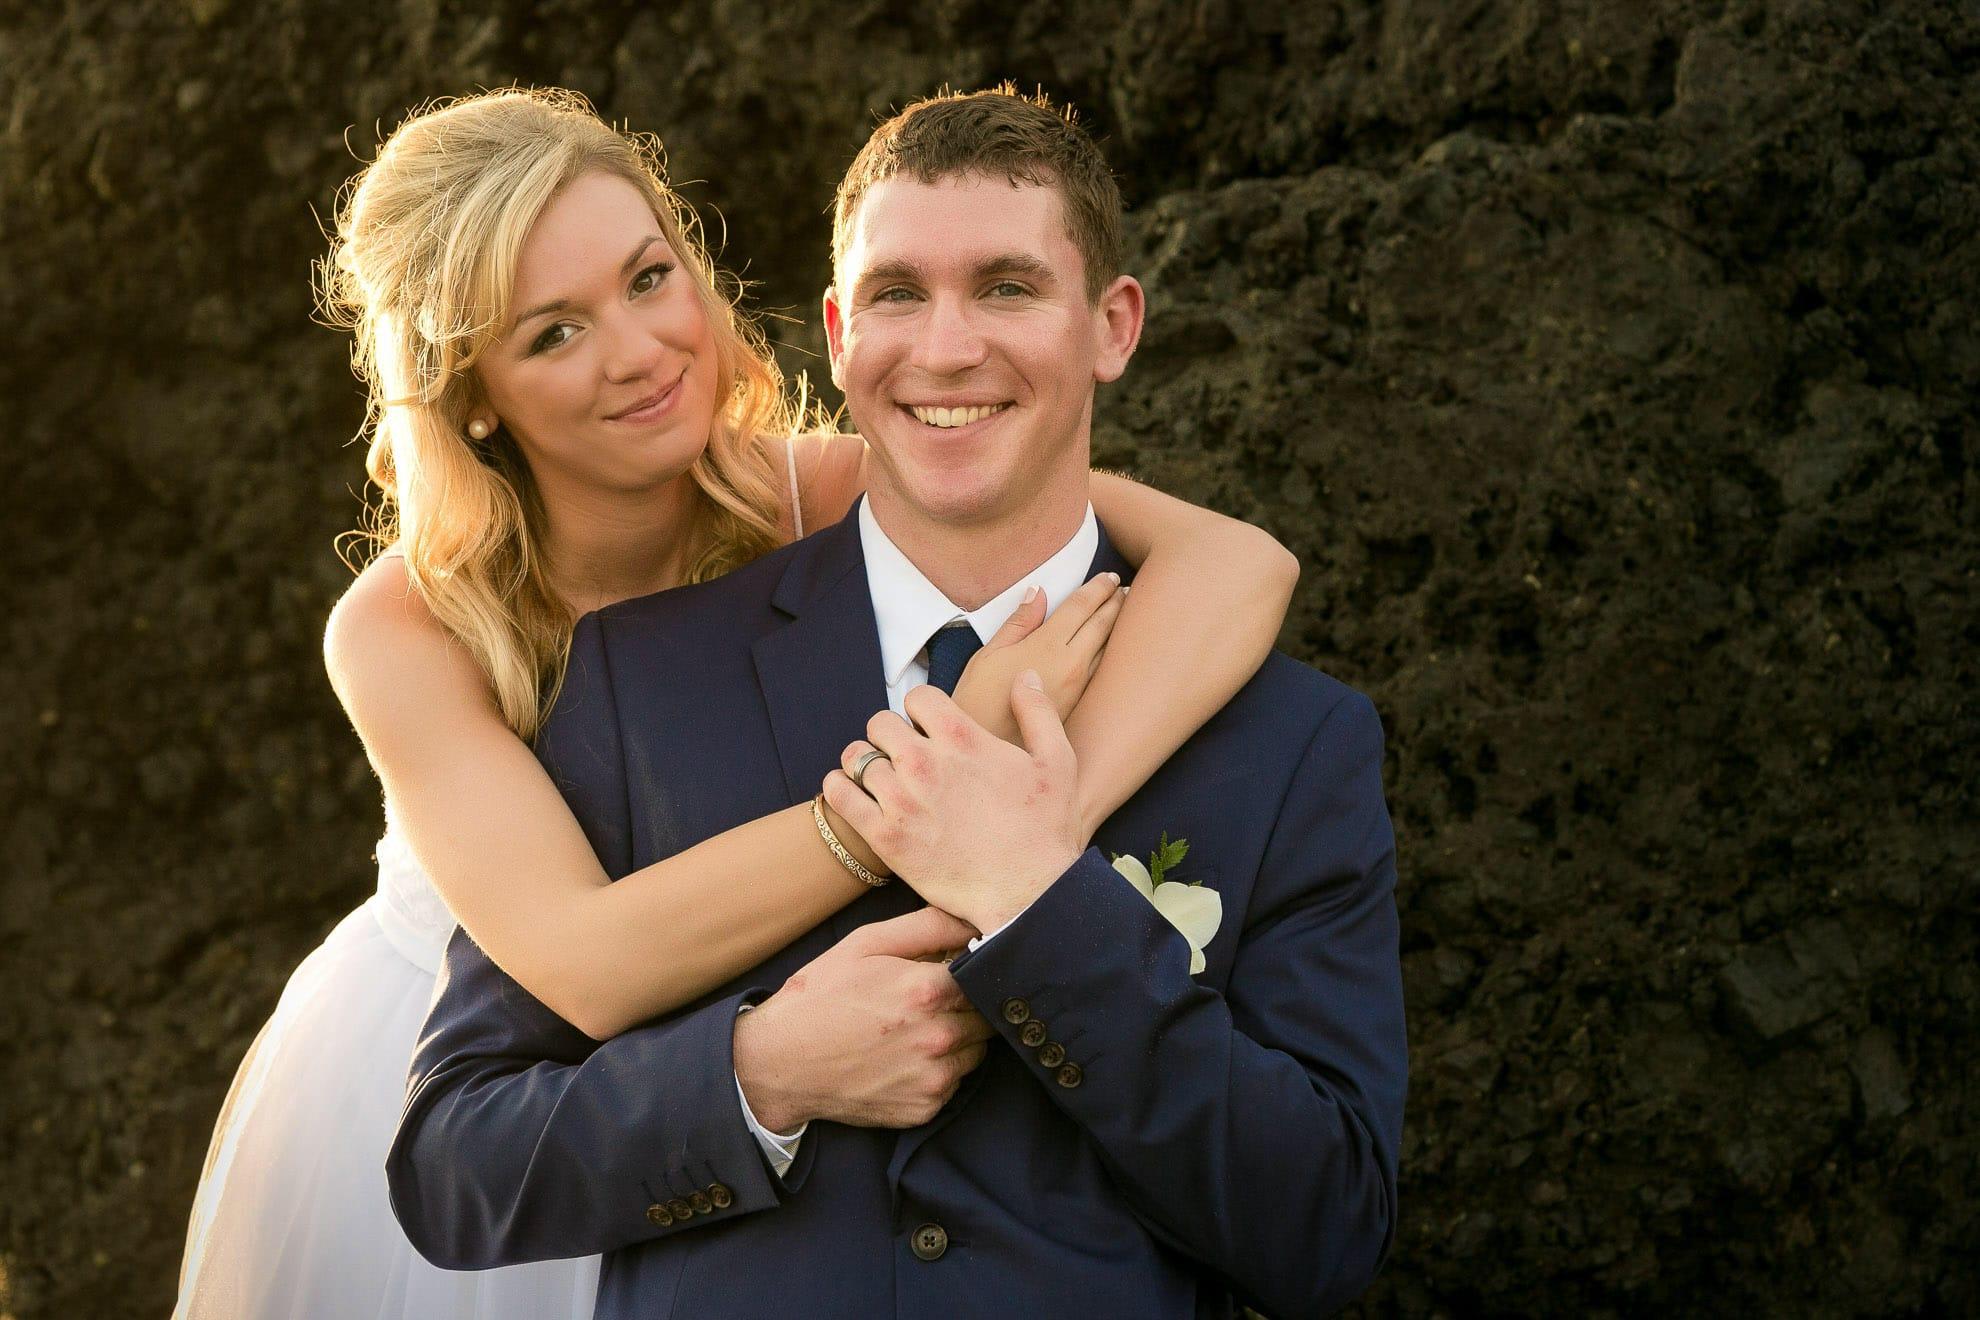 Golden light at wedding